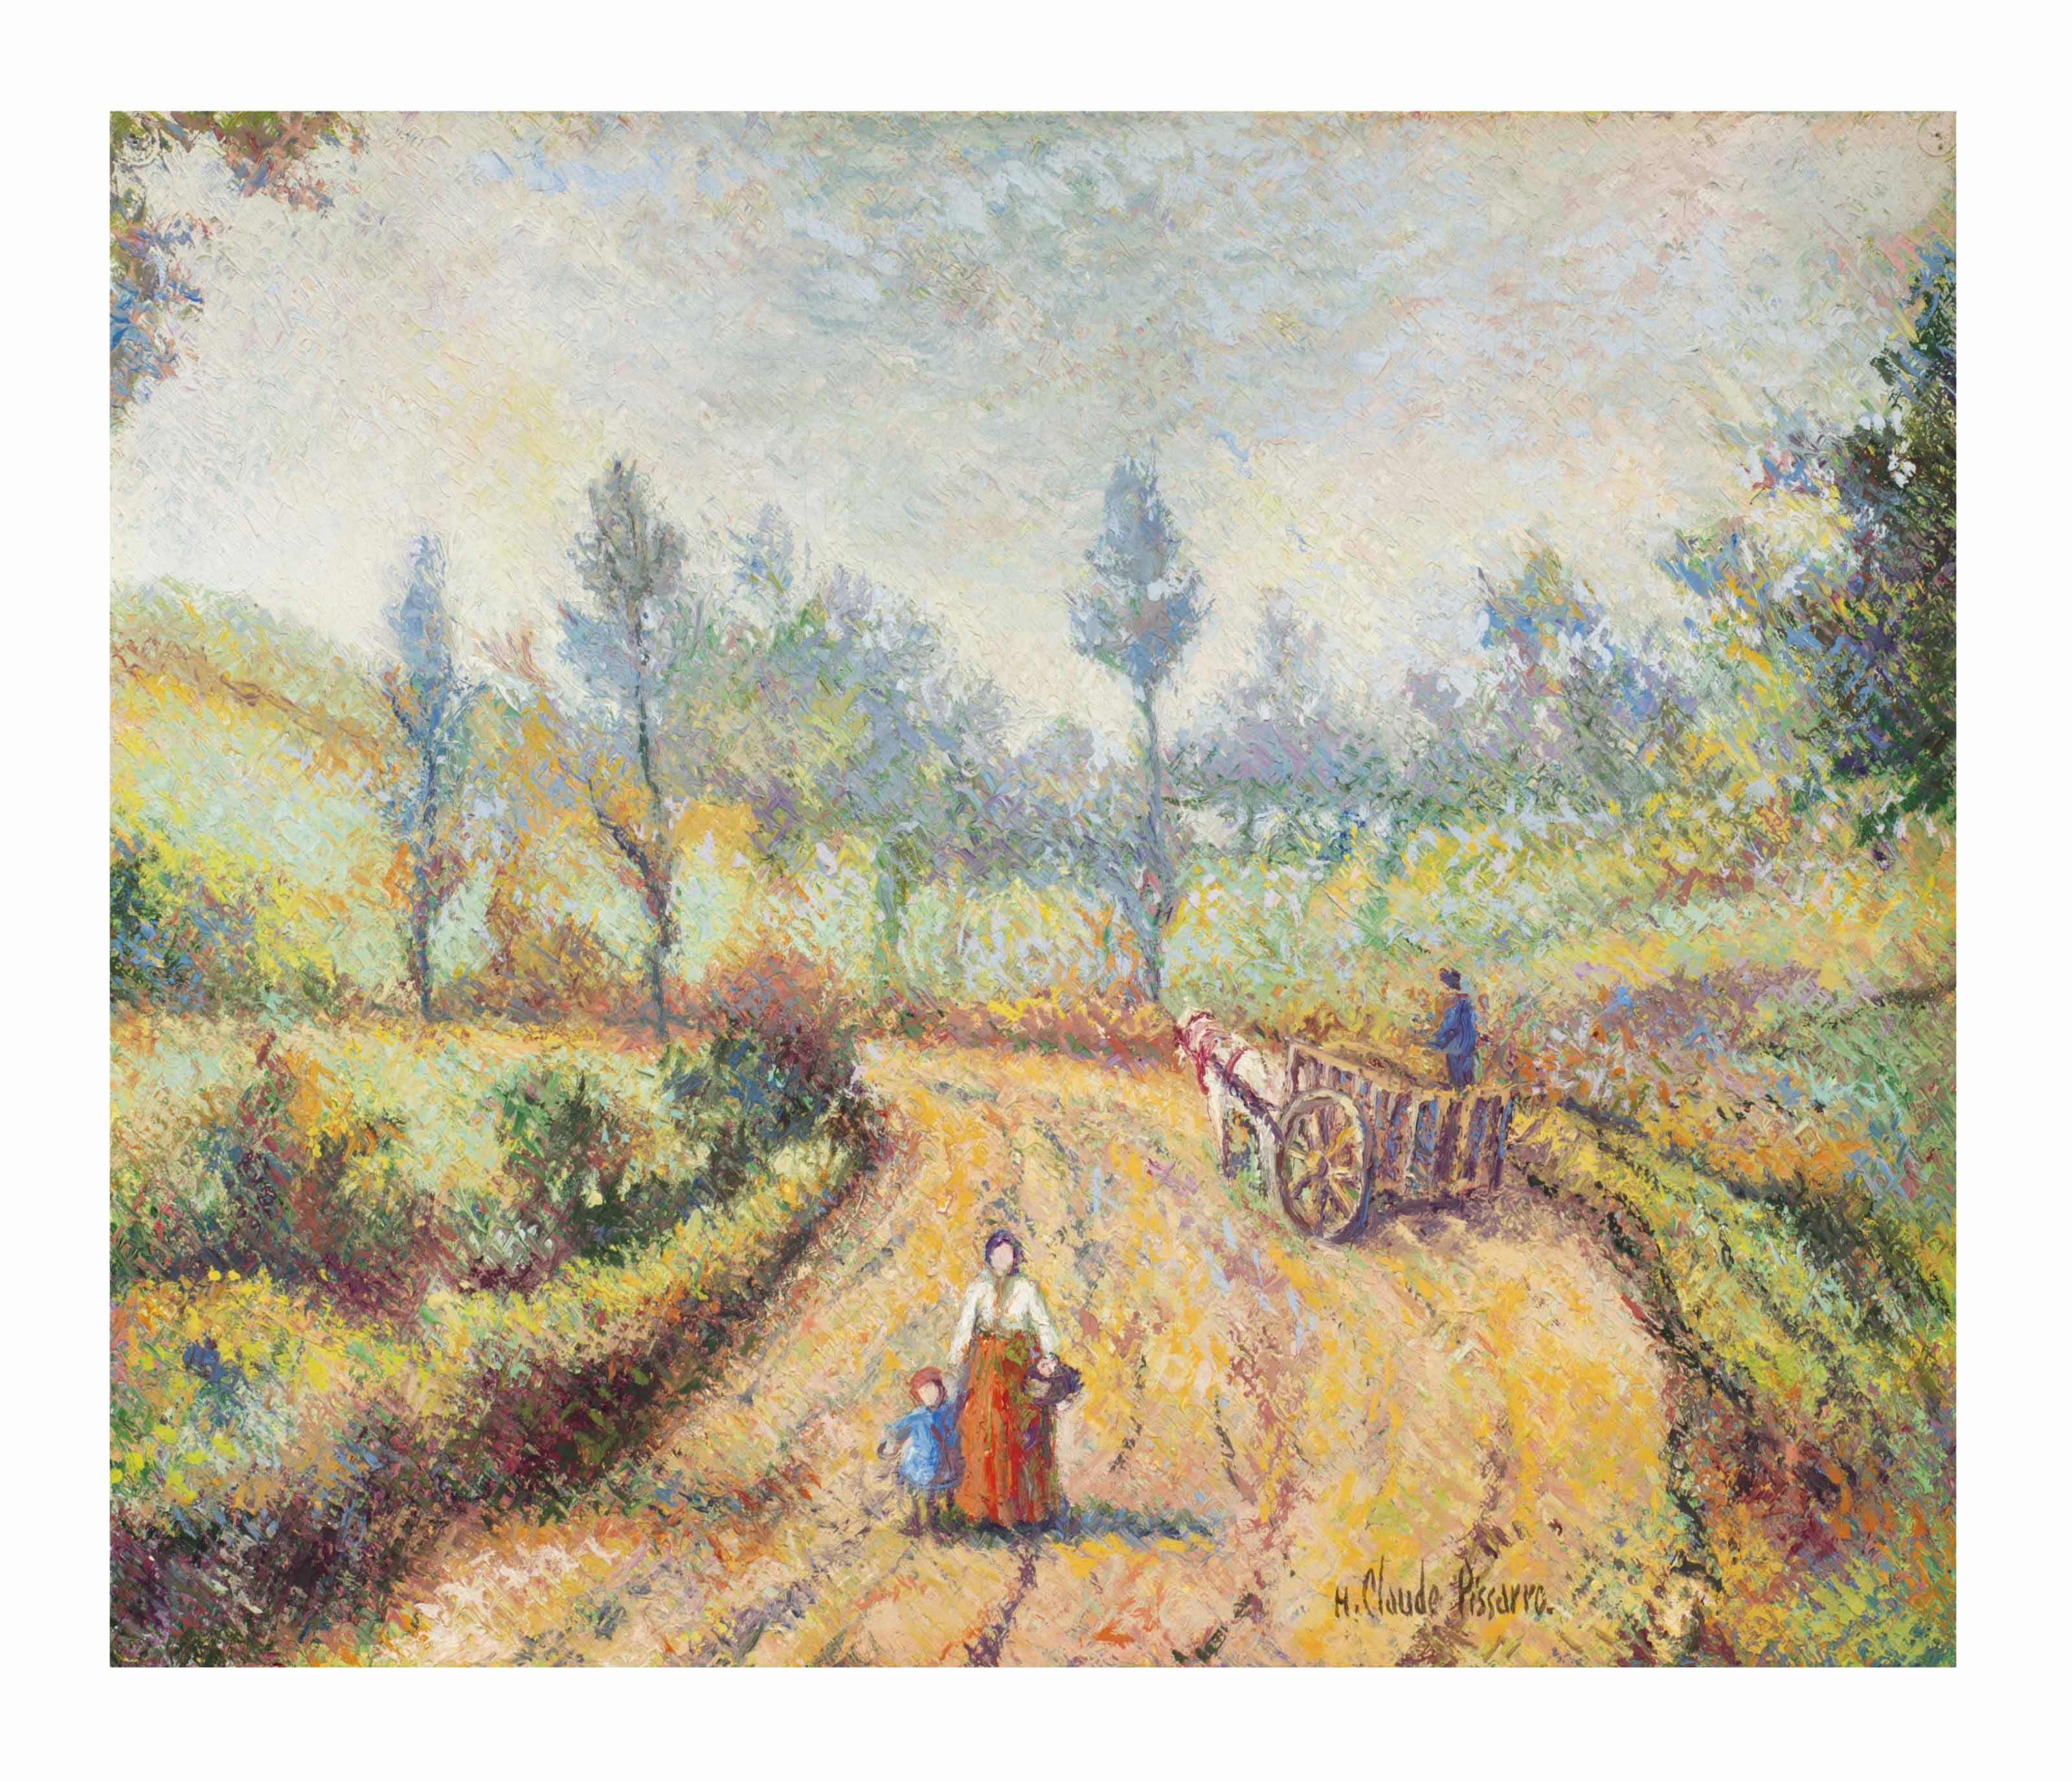 Hugues Claude Pissarro (French